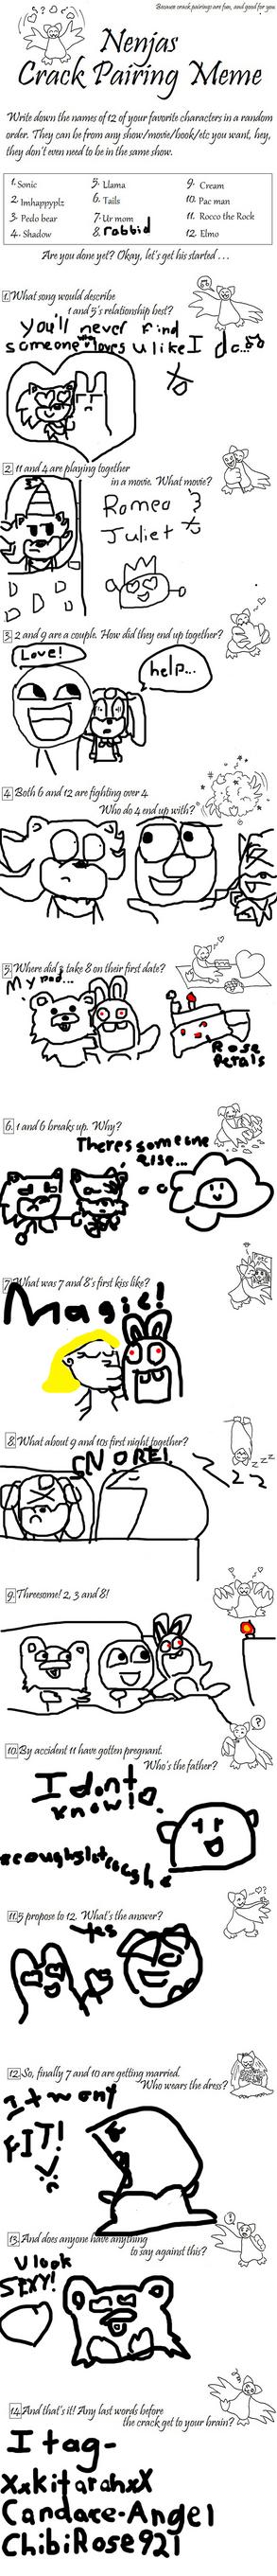 Random crack pairing meme by MiZzy-IzZy